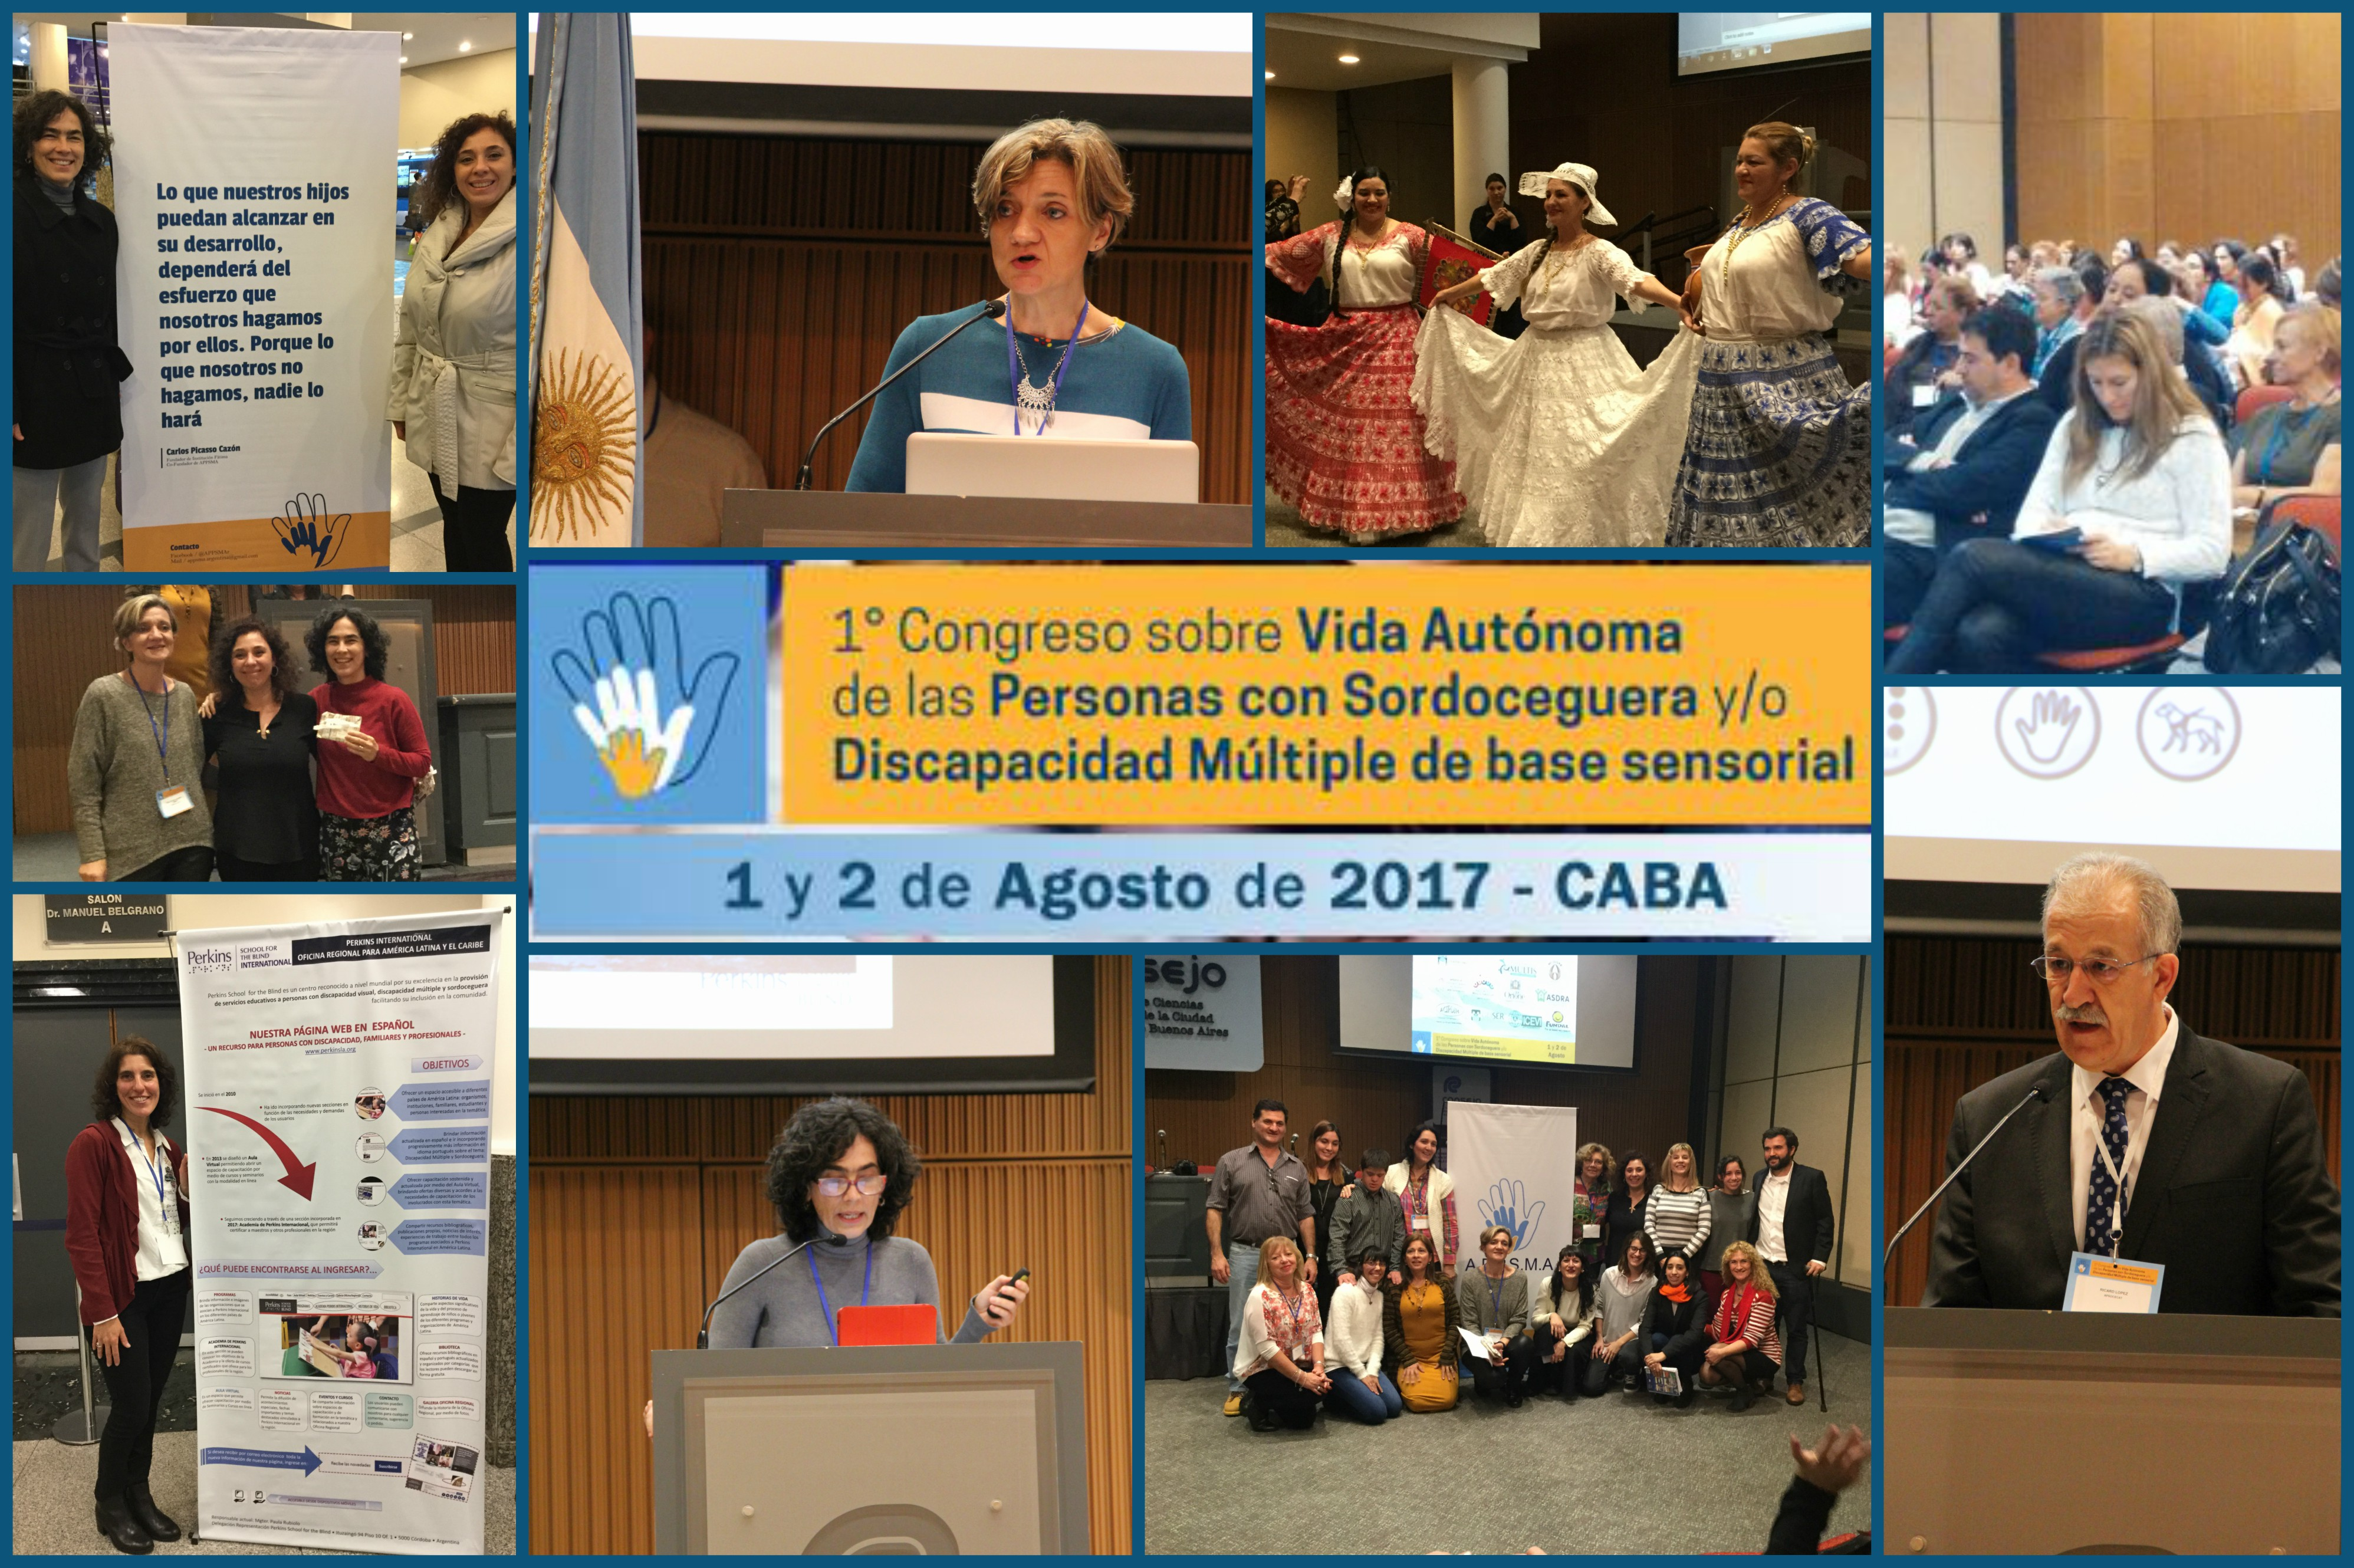 Congreso sobre vida Autónoma de personas con sordoceguera o discapacidad múltiple